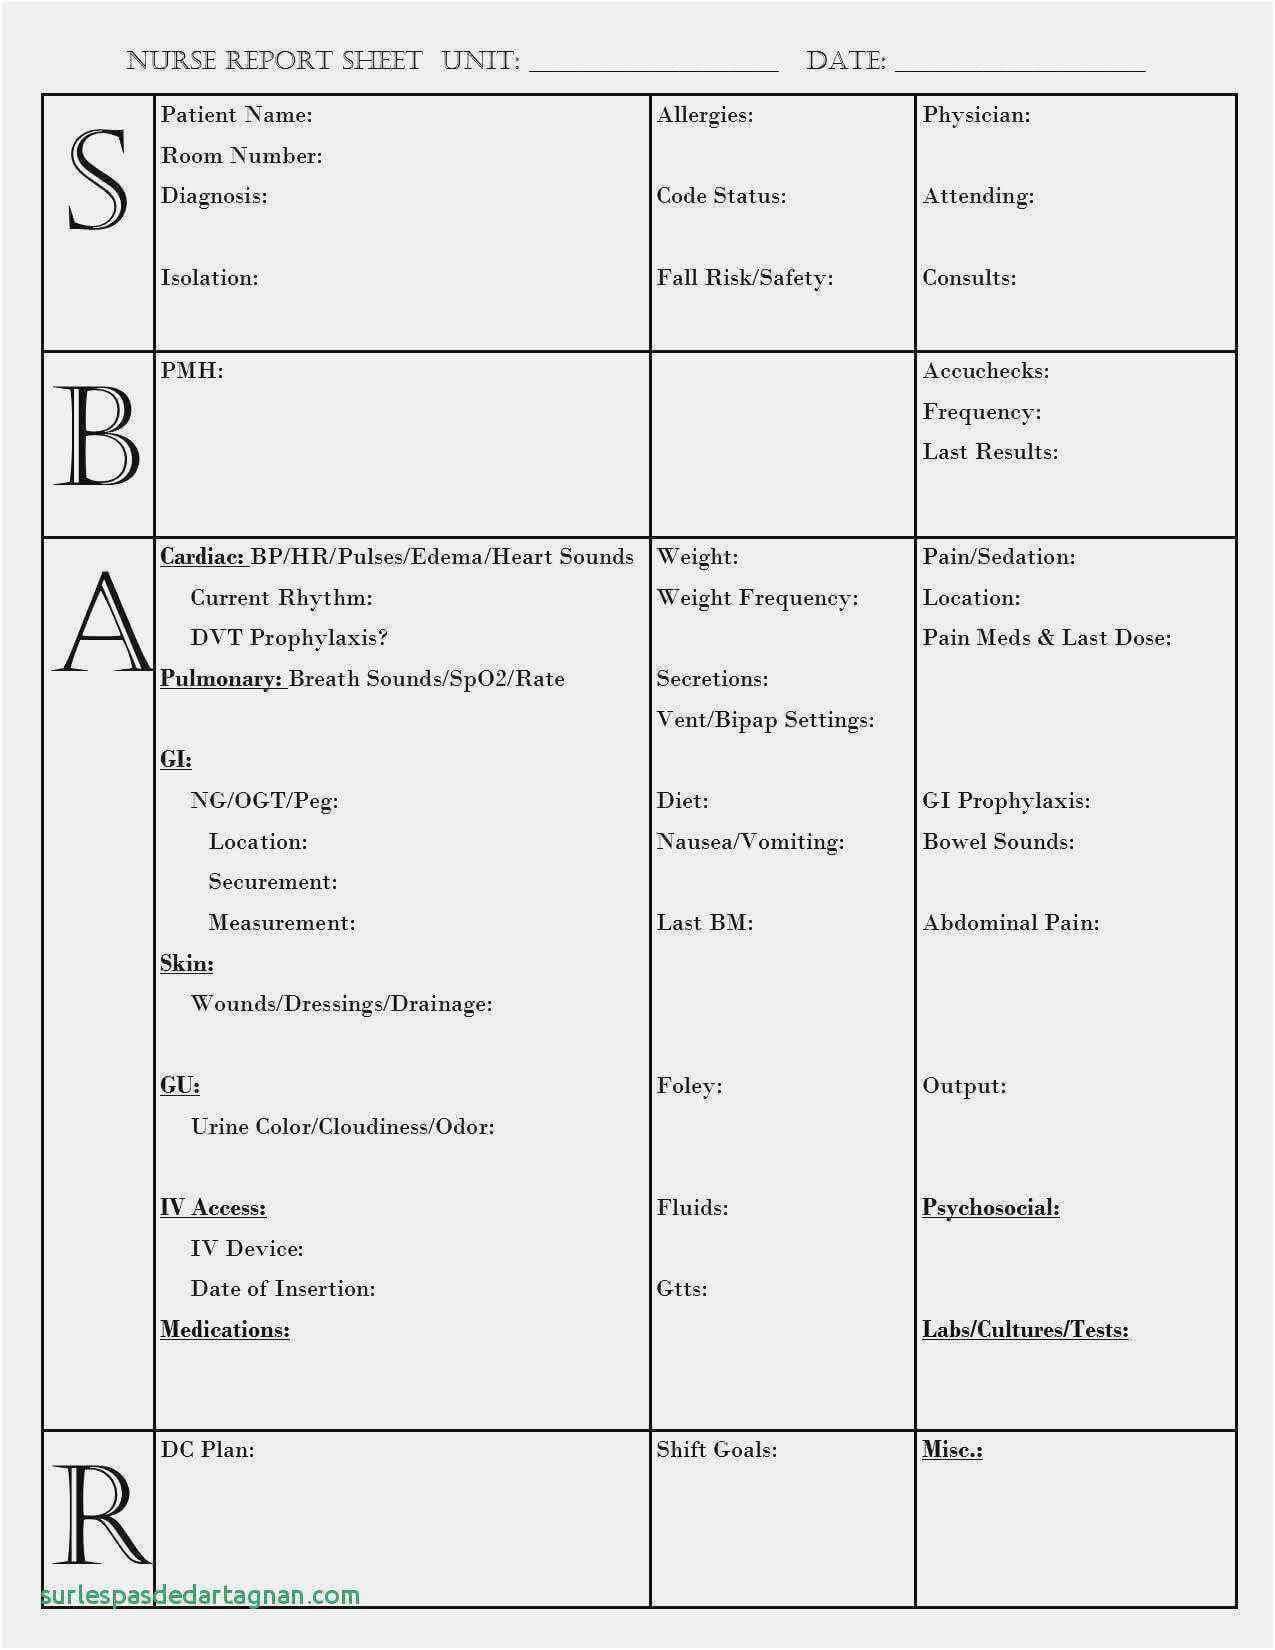 Free Collection Nursing Shift Change Report Sheet Elegant With Regard To Charge Nurse Report Sheet Template